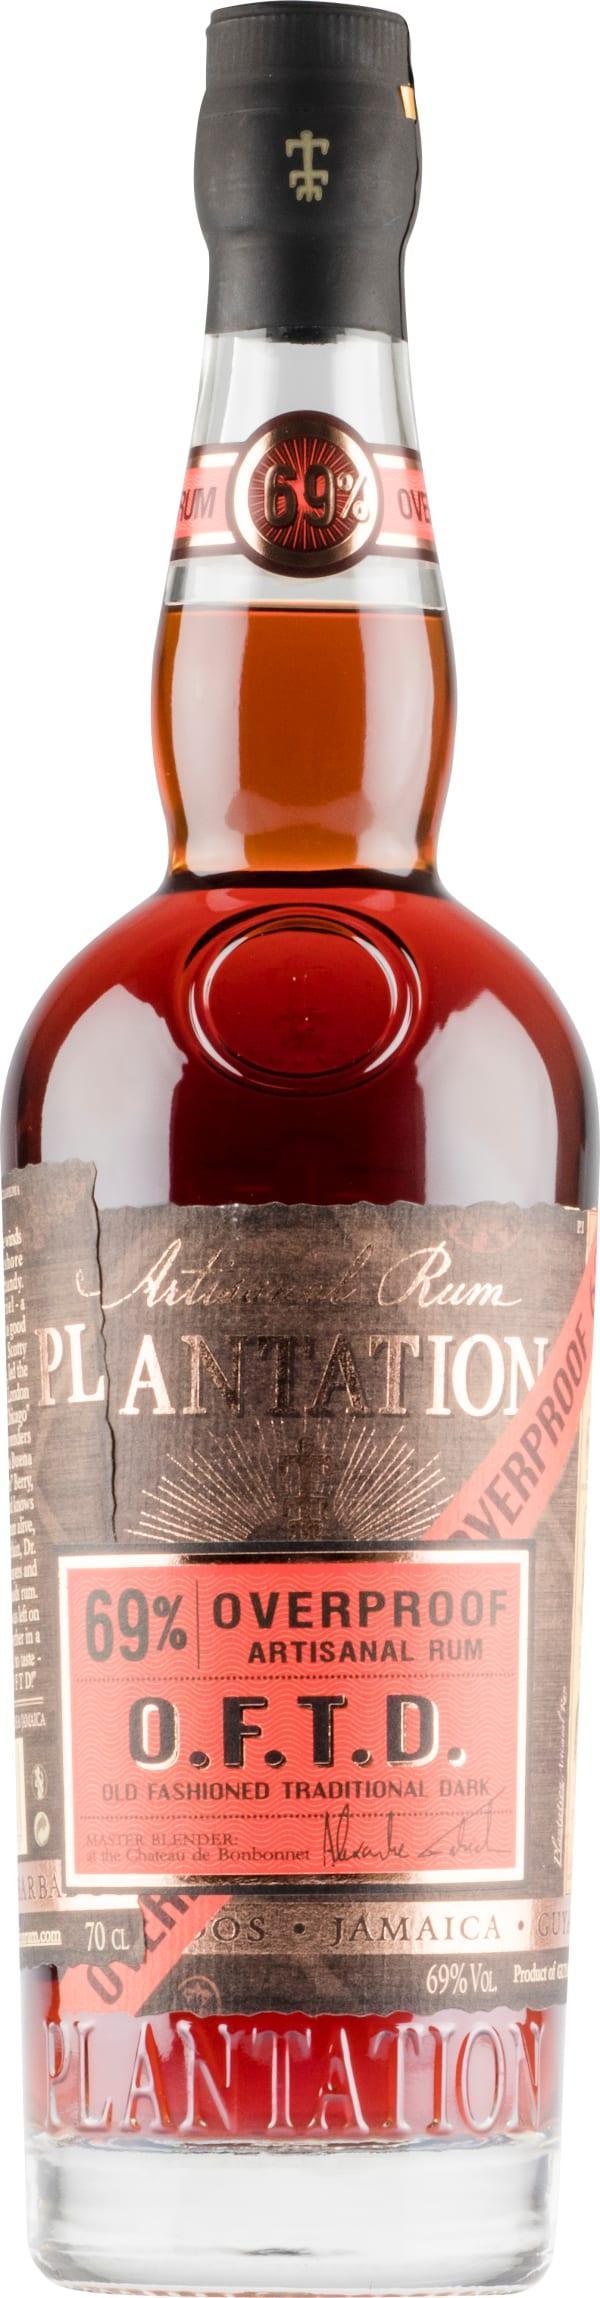 Plantation O.F.D.T